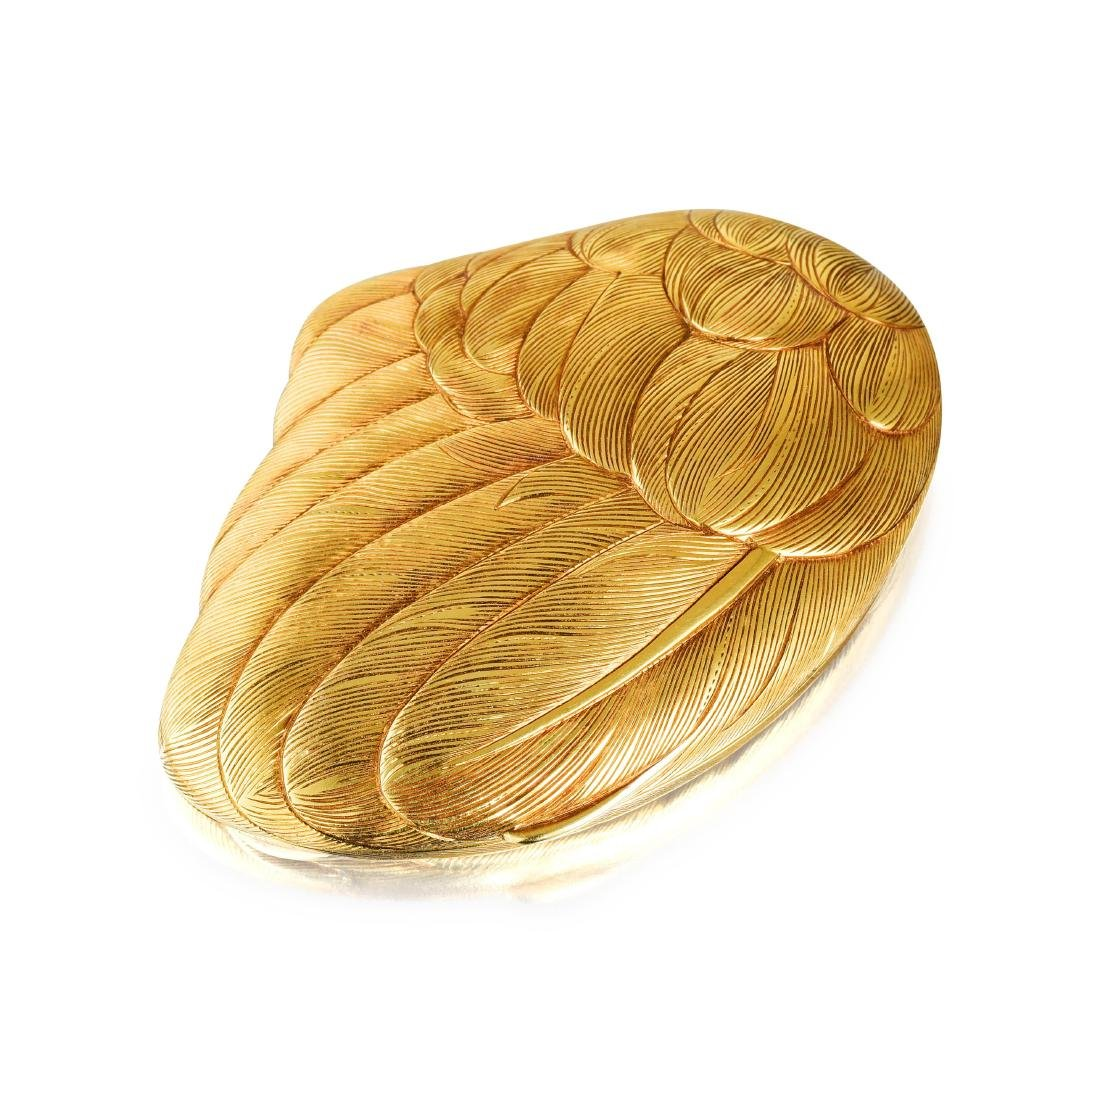 Serafini Vintage Gold Wing Powder Compact